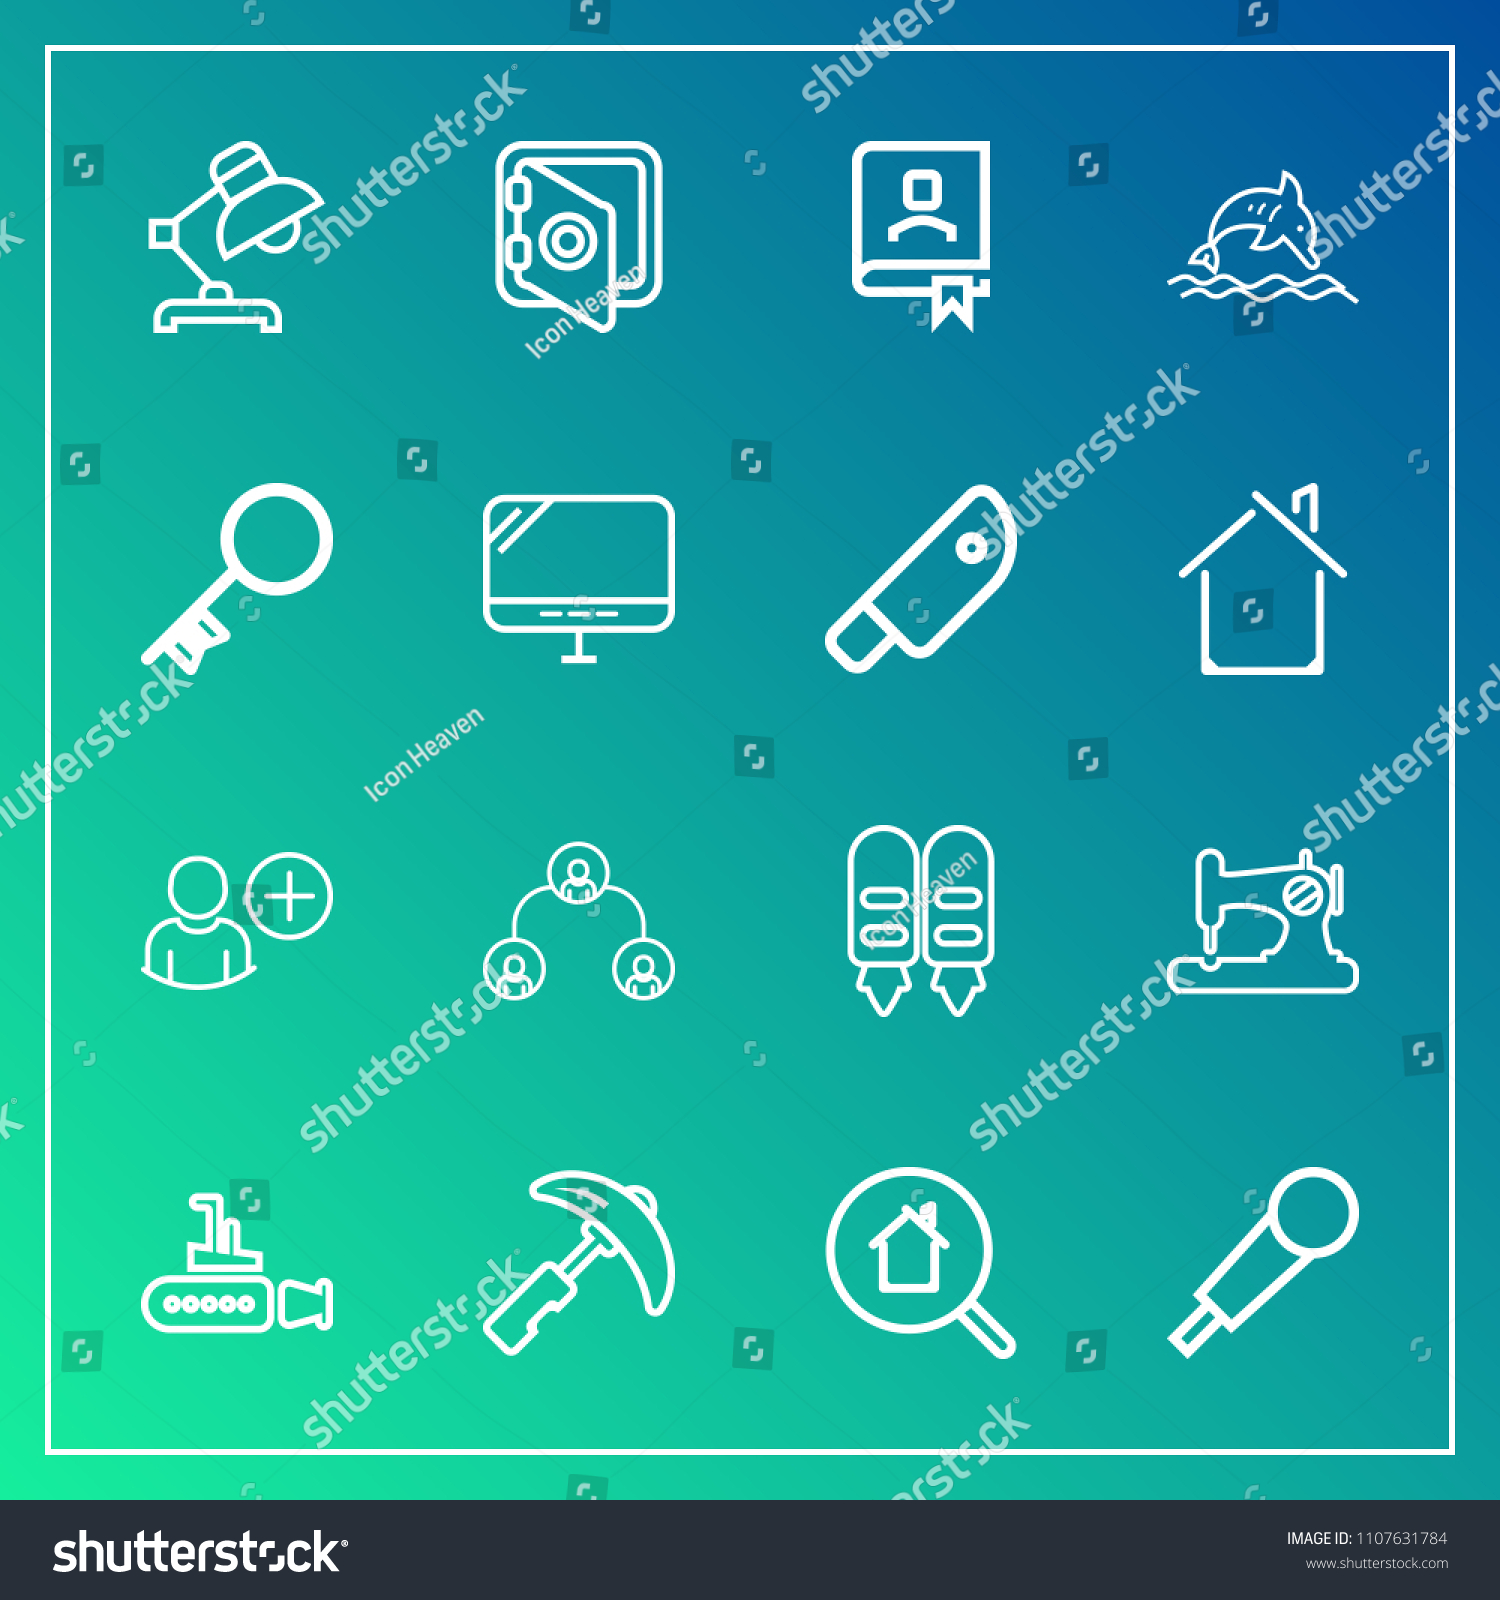 Modern Simple Vector Icon Set On Stock Vector 1107631784 - Shutterstock